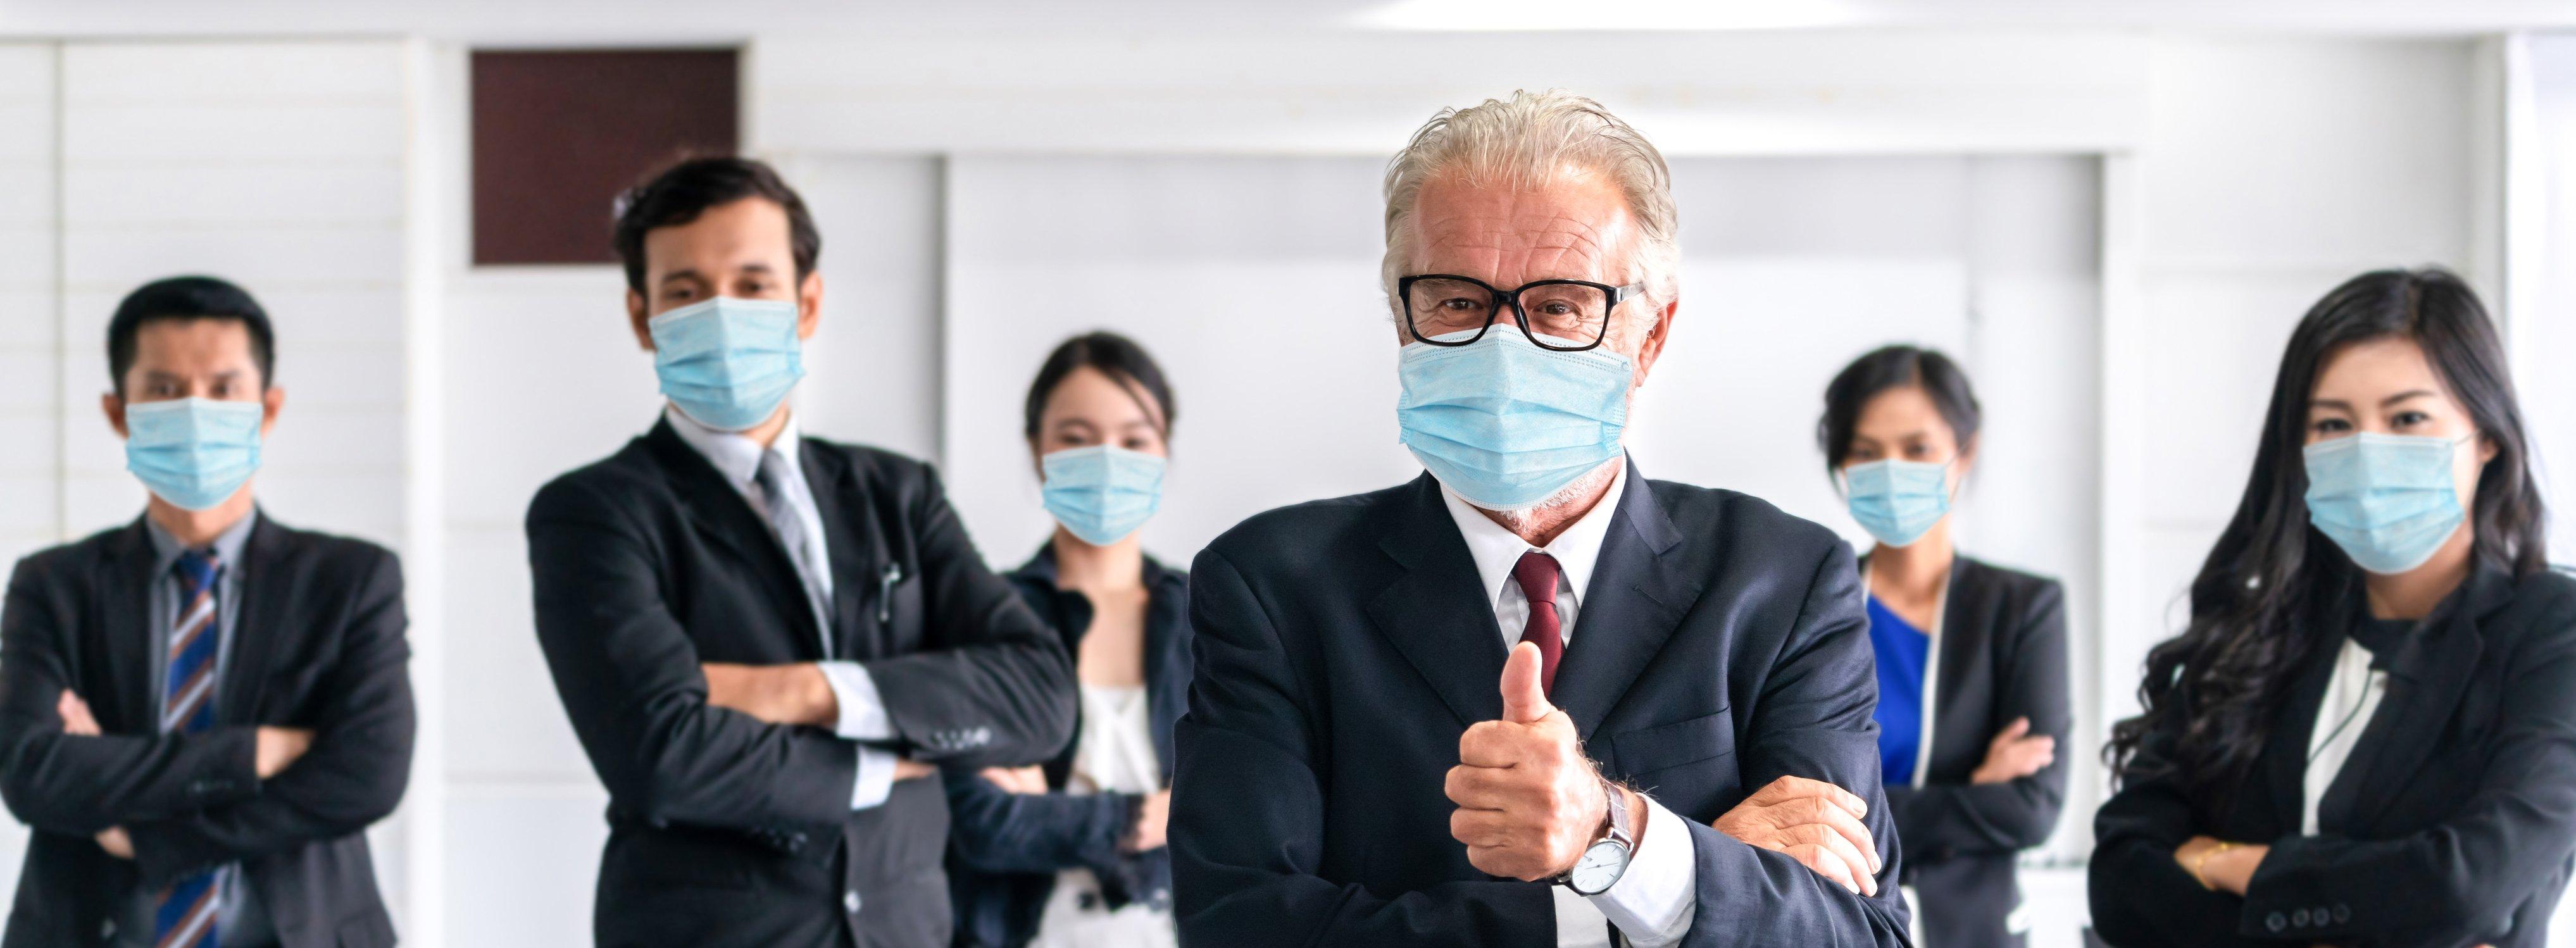 business masks